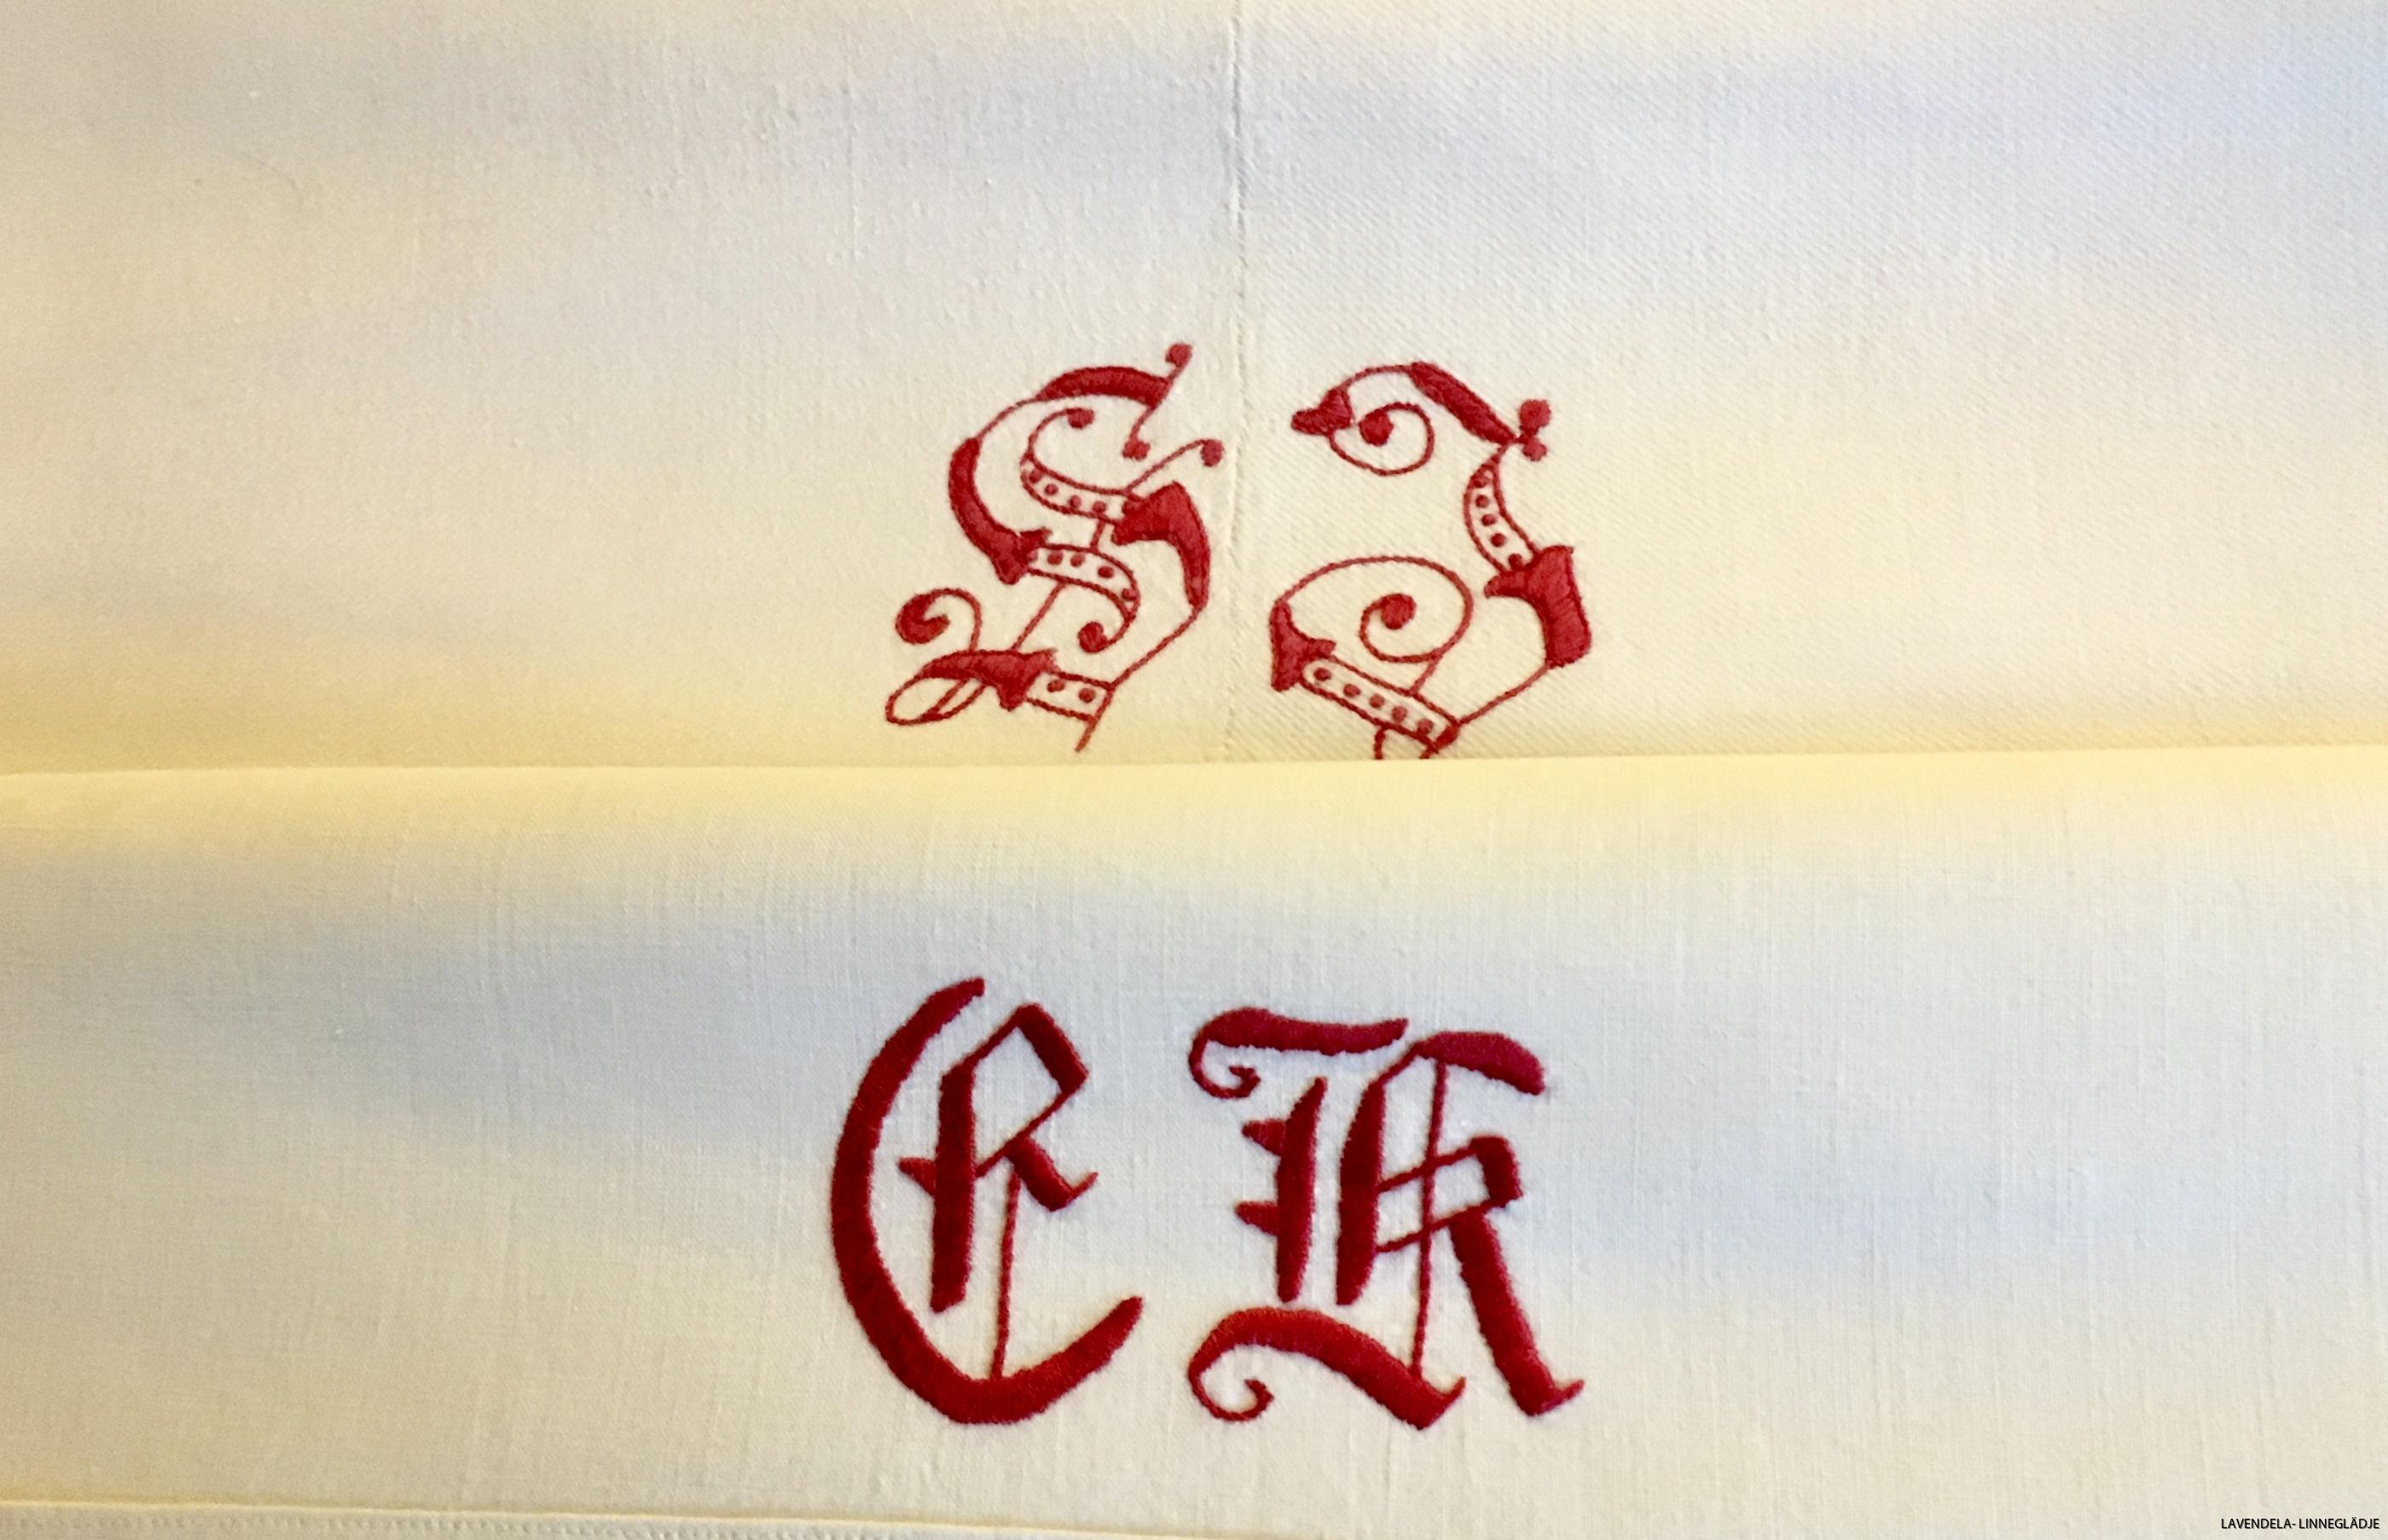 Vackra röda monogram